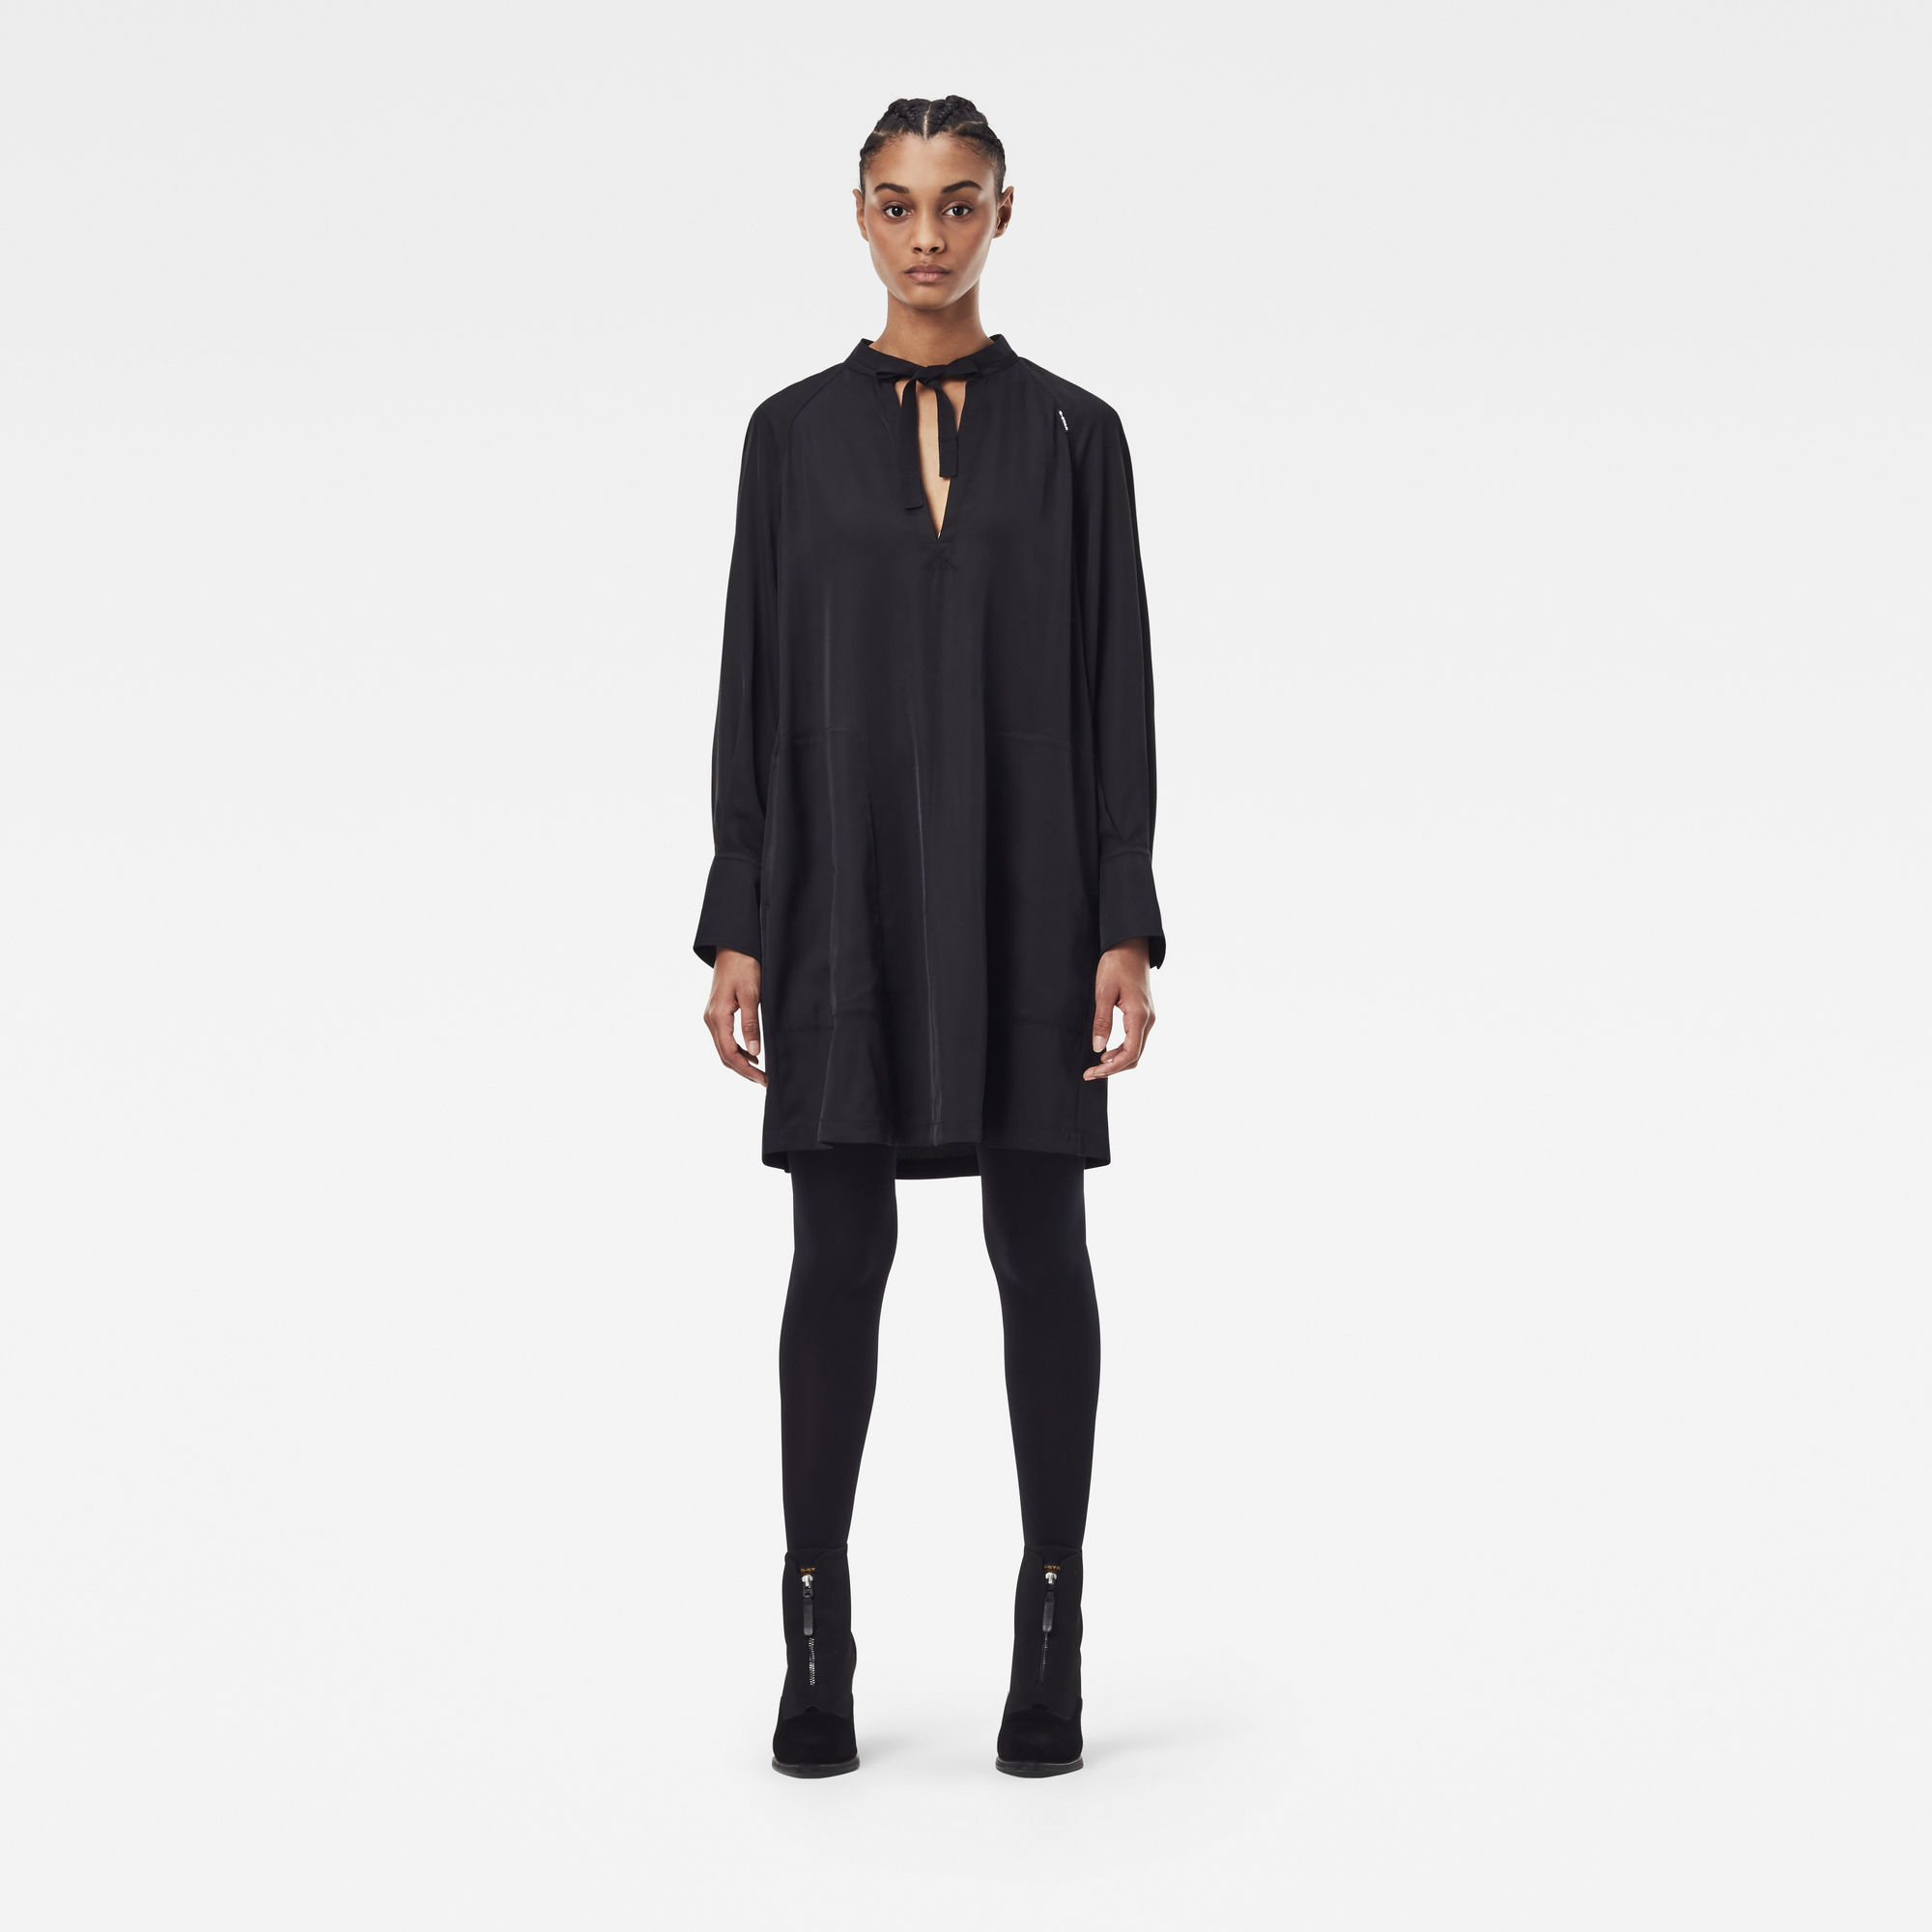 G-Star RAW Dames V-neck tunic dress Zwart